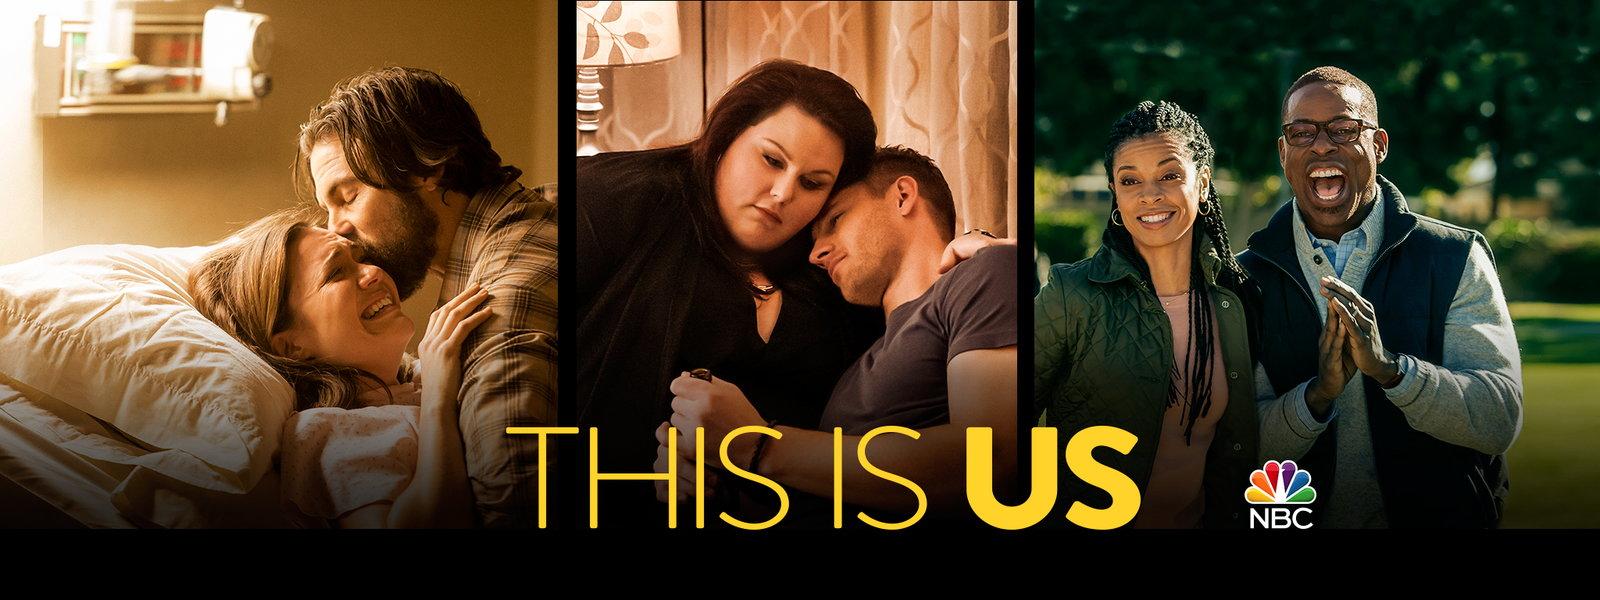 This Is Us - Season 1 - Mp4 x264 AC3 1080p